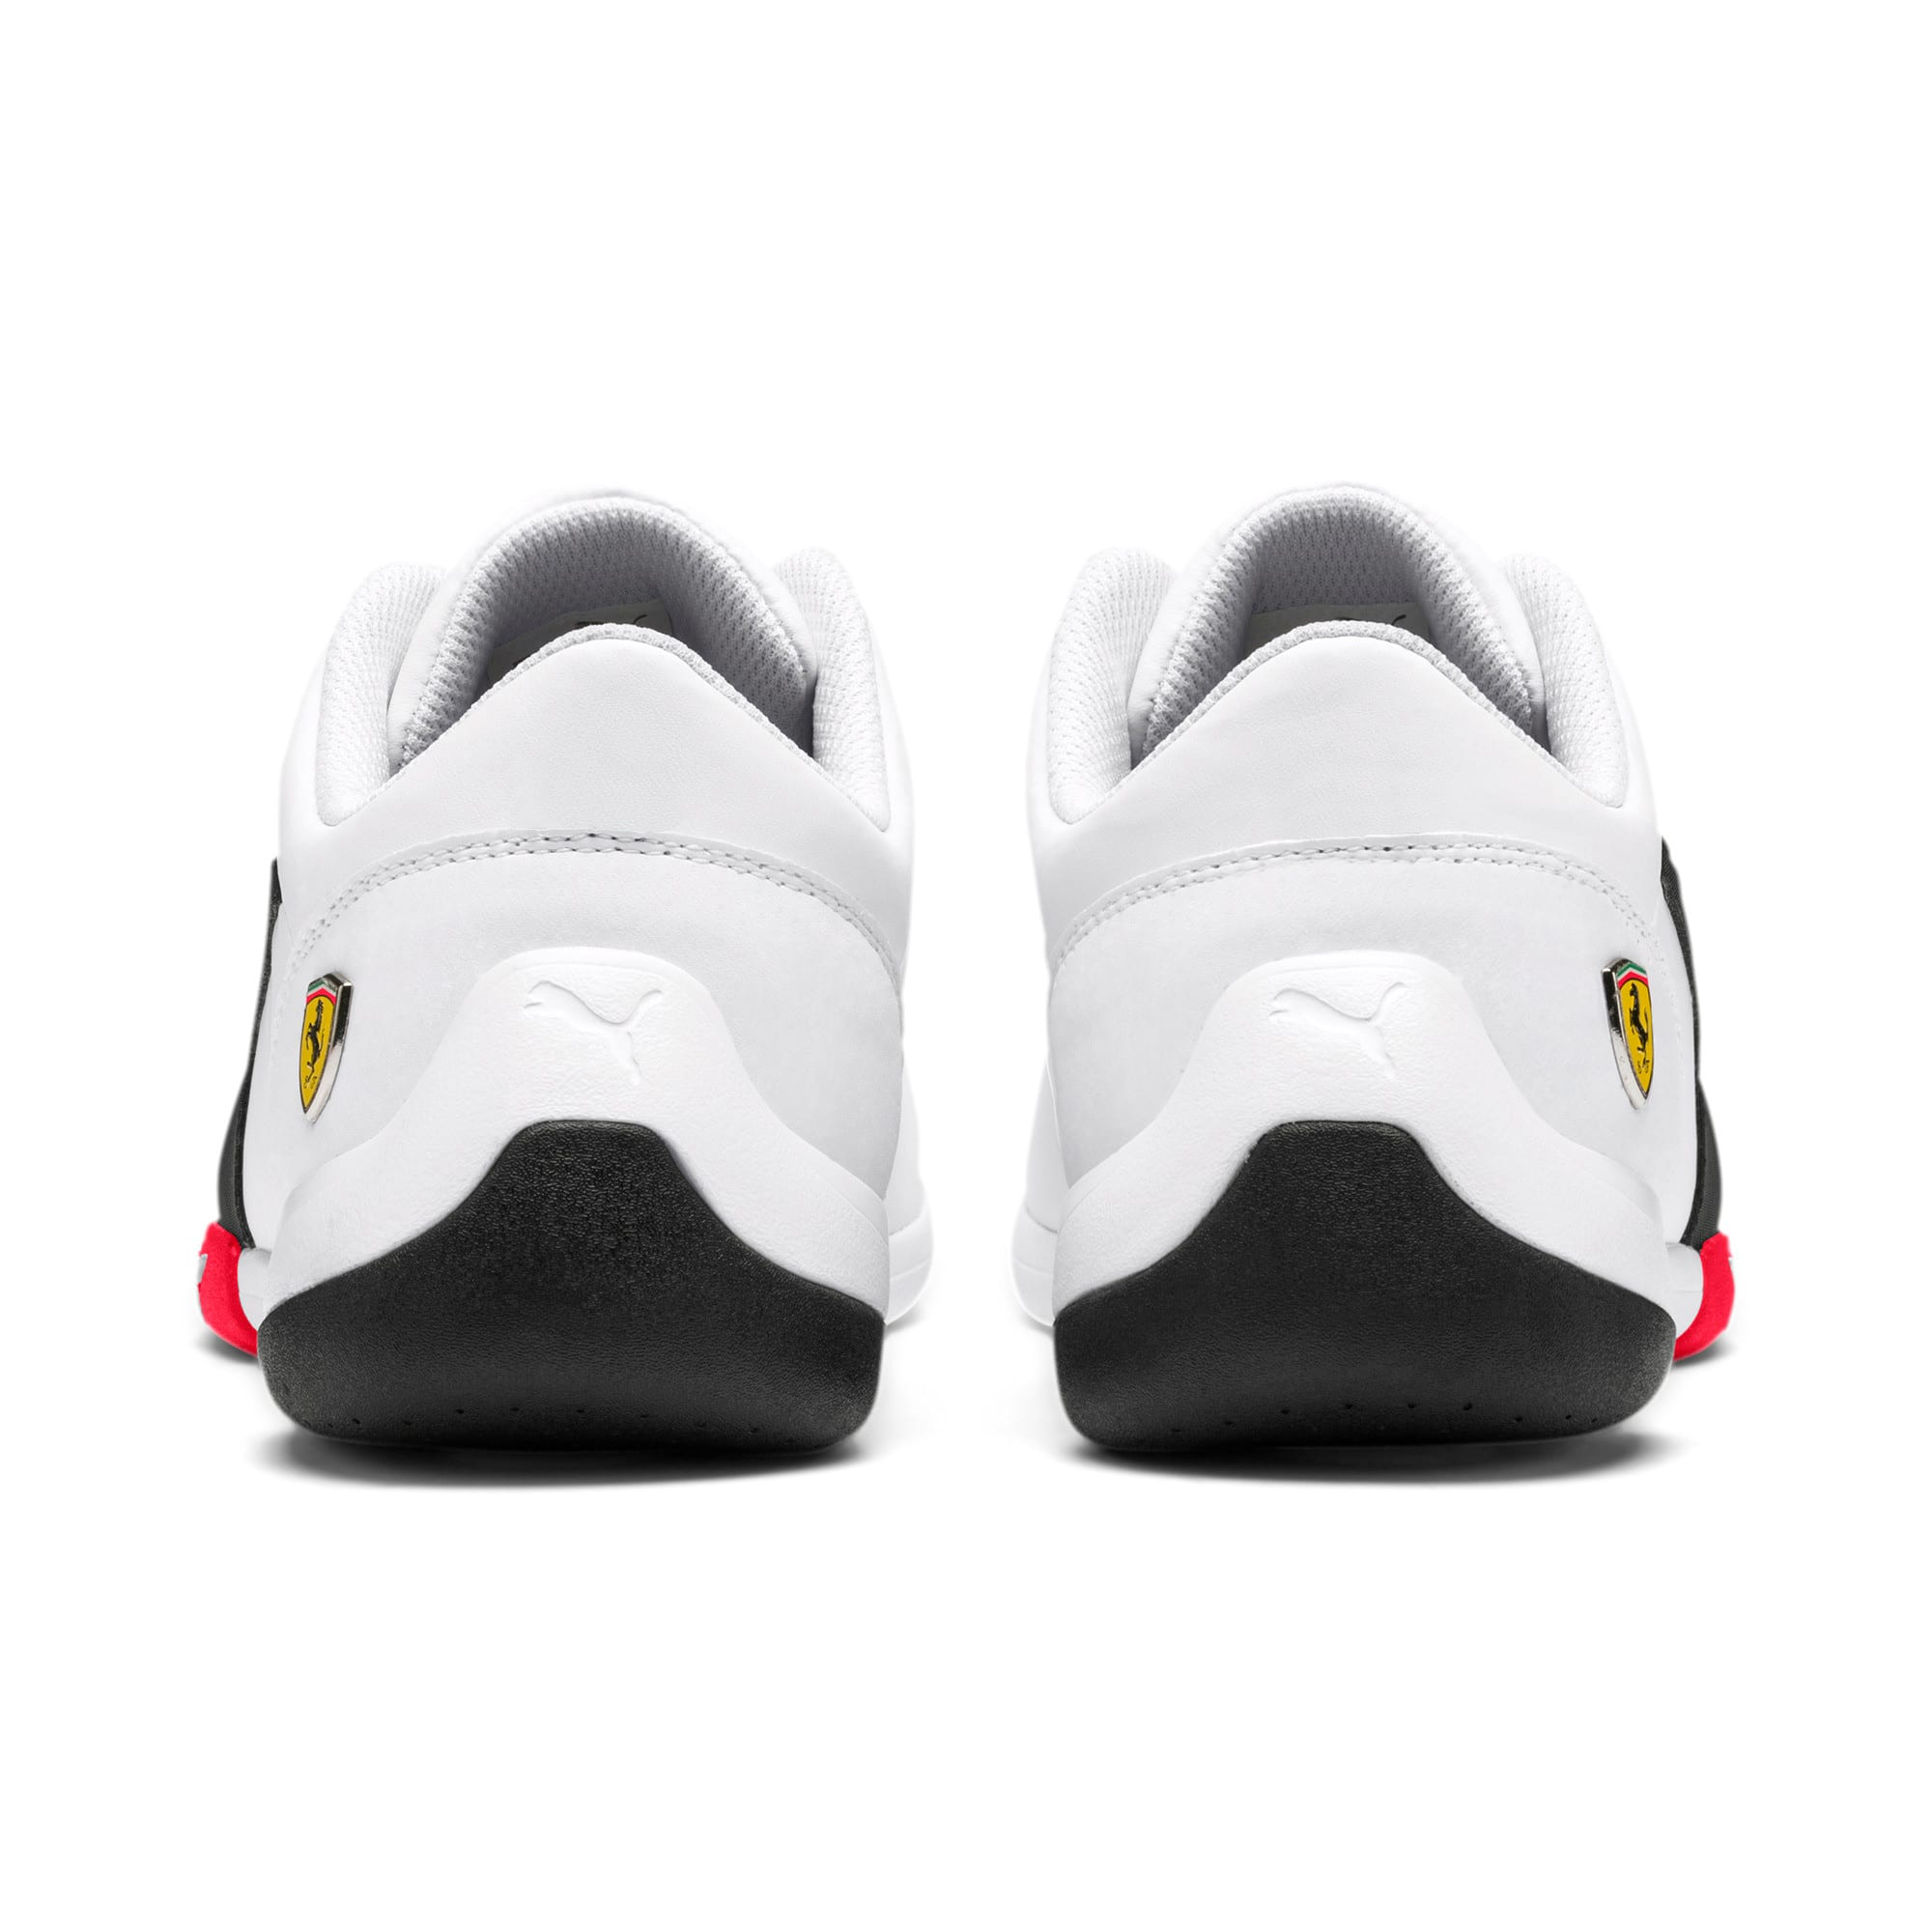 Thumbnail 5 of Scuderia Ferrari Kart Cat III Shoes, White-Black-Rosso Corsa, medium